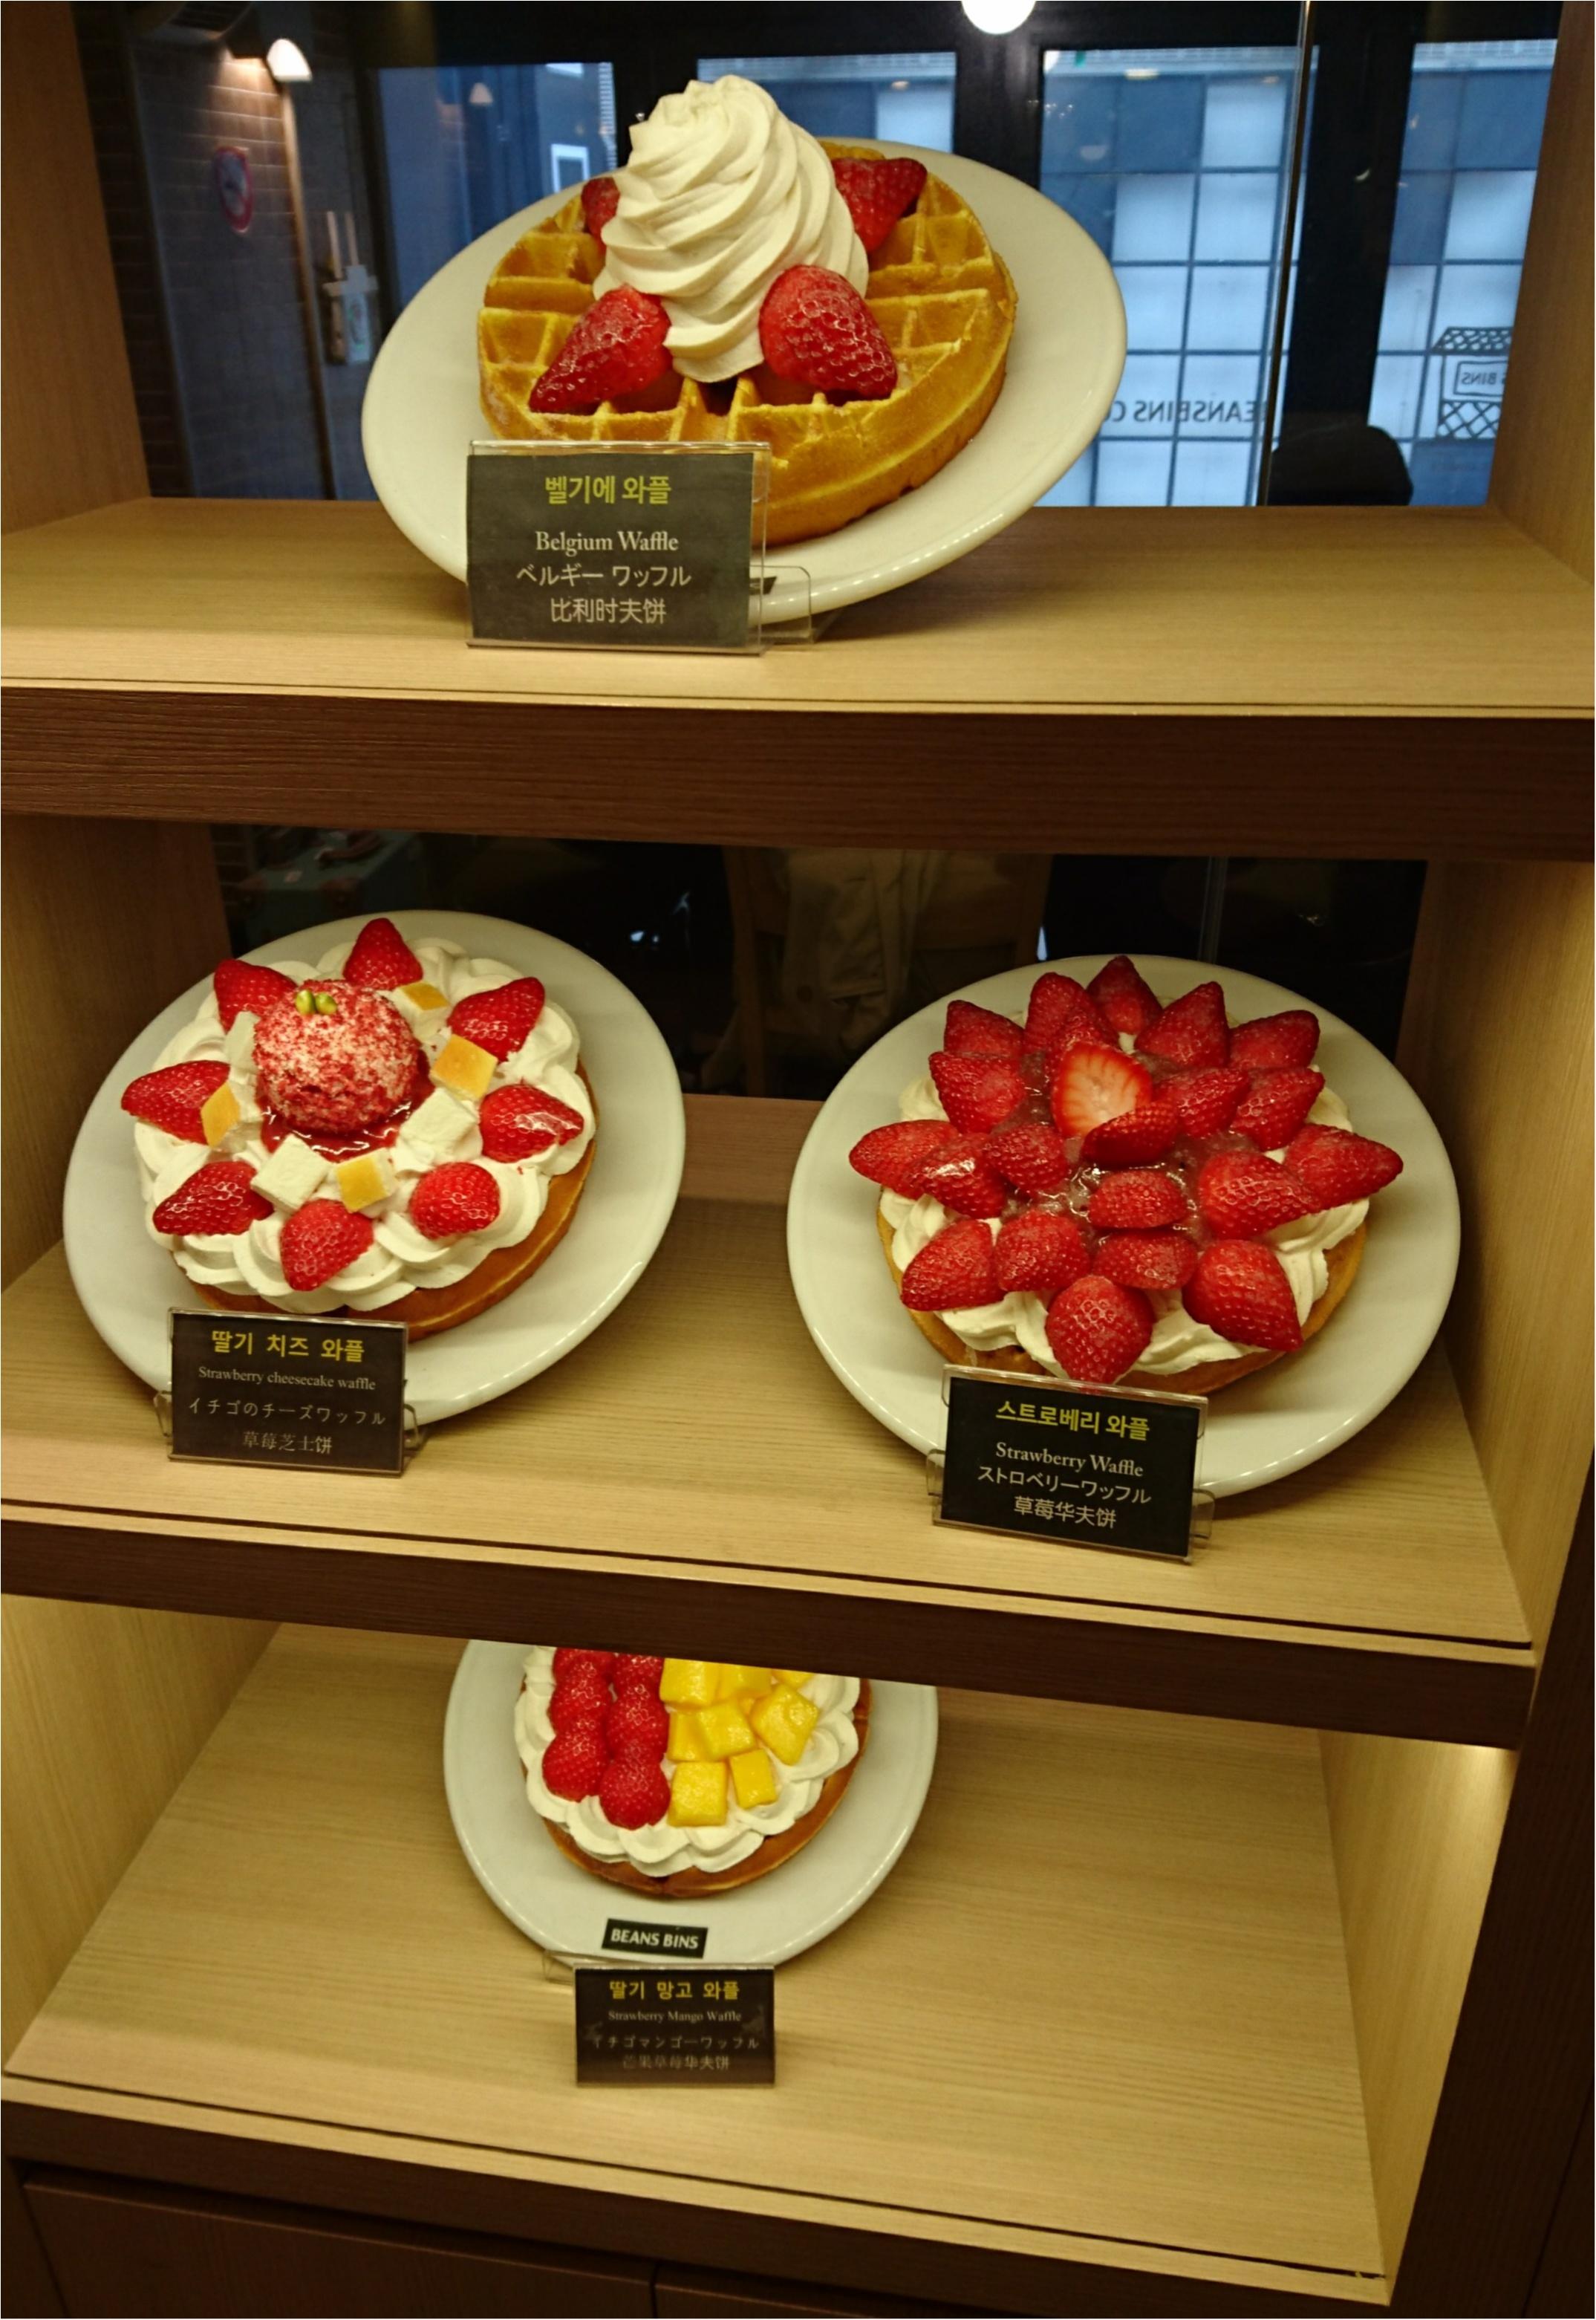 【trip】ソウルに行ったら絶対食べたい!ひそかに話題沸騰のインスタ映えワッフル♡_3_2